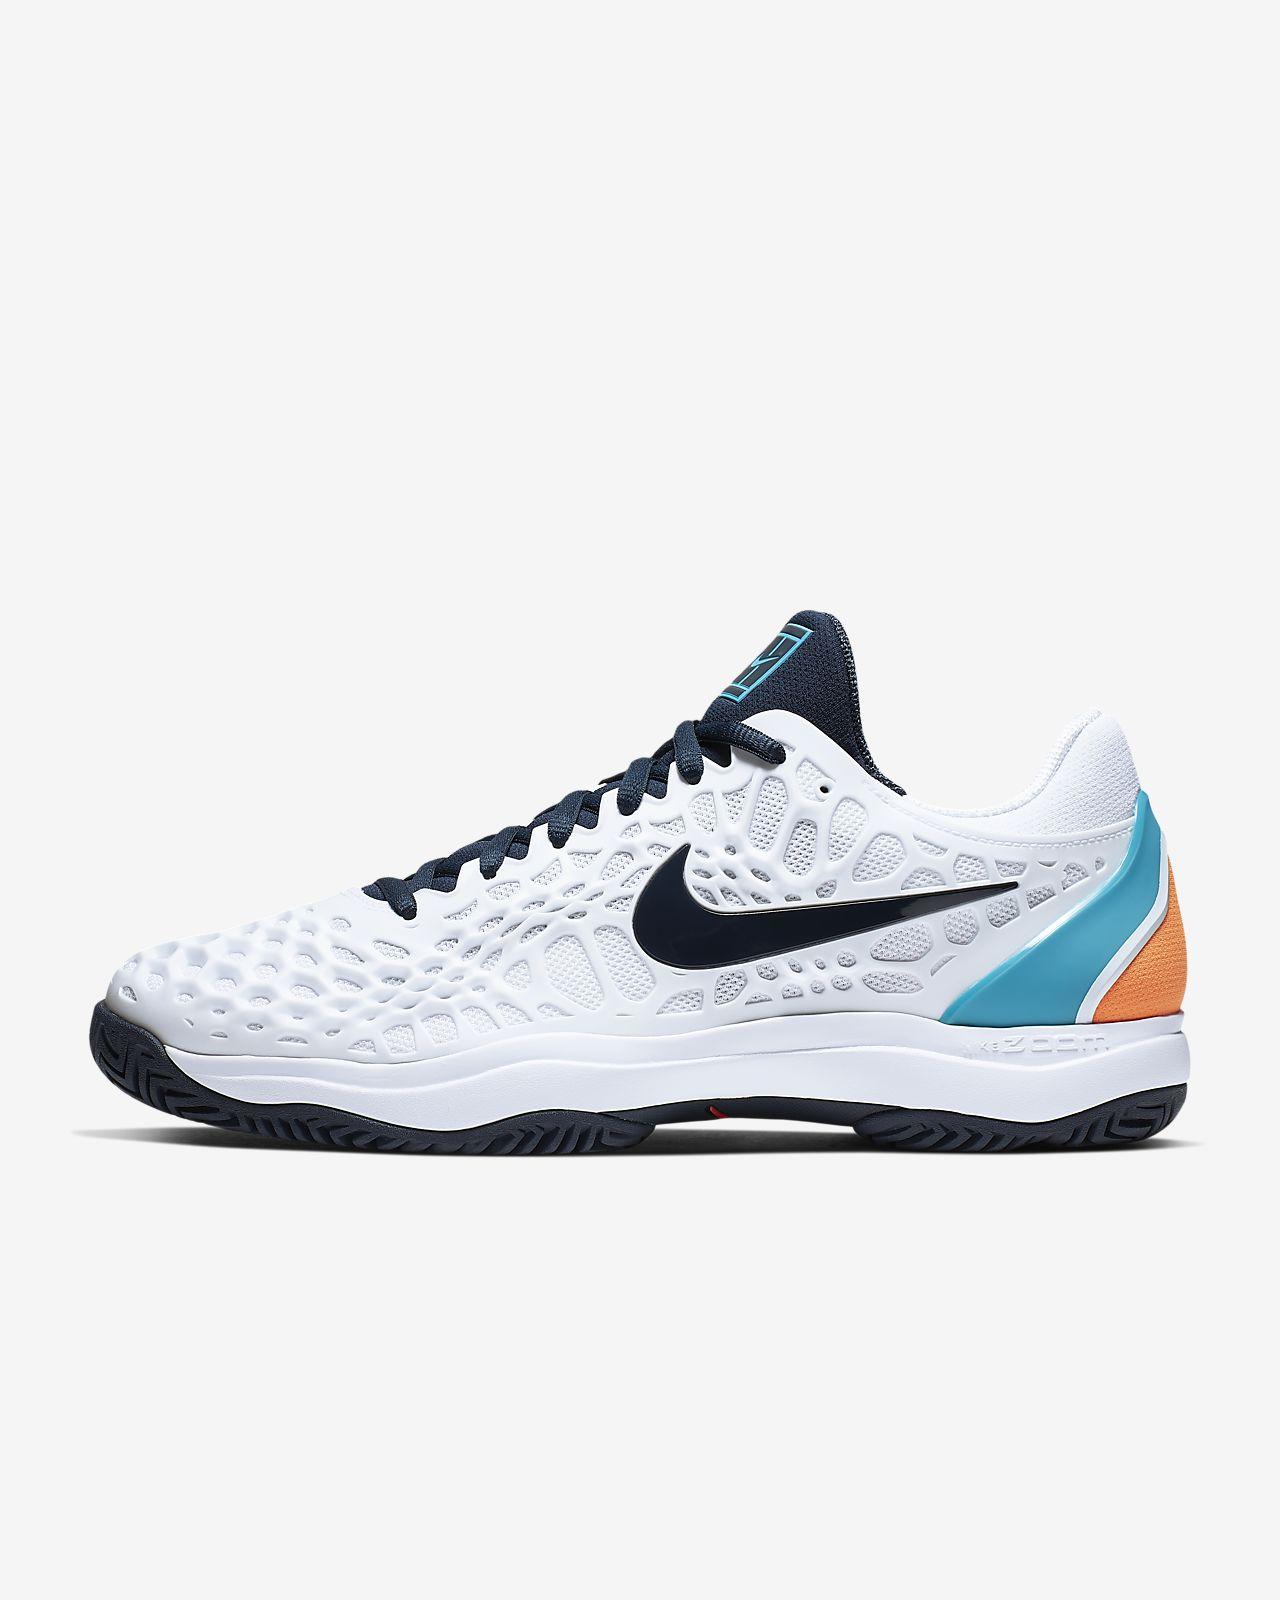 4222aa681fd73 NikeCourt Zoom Cage 3 Men s Hard Court Tennis Shoe. Nike.com